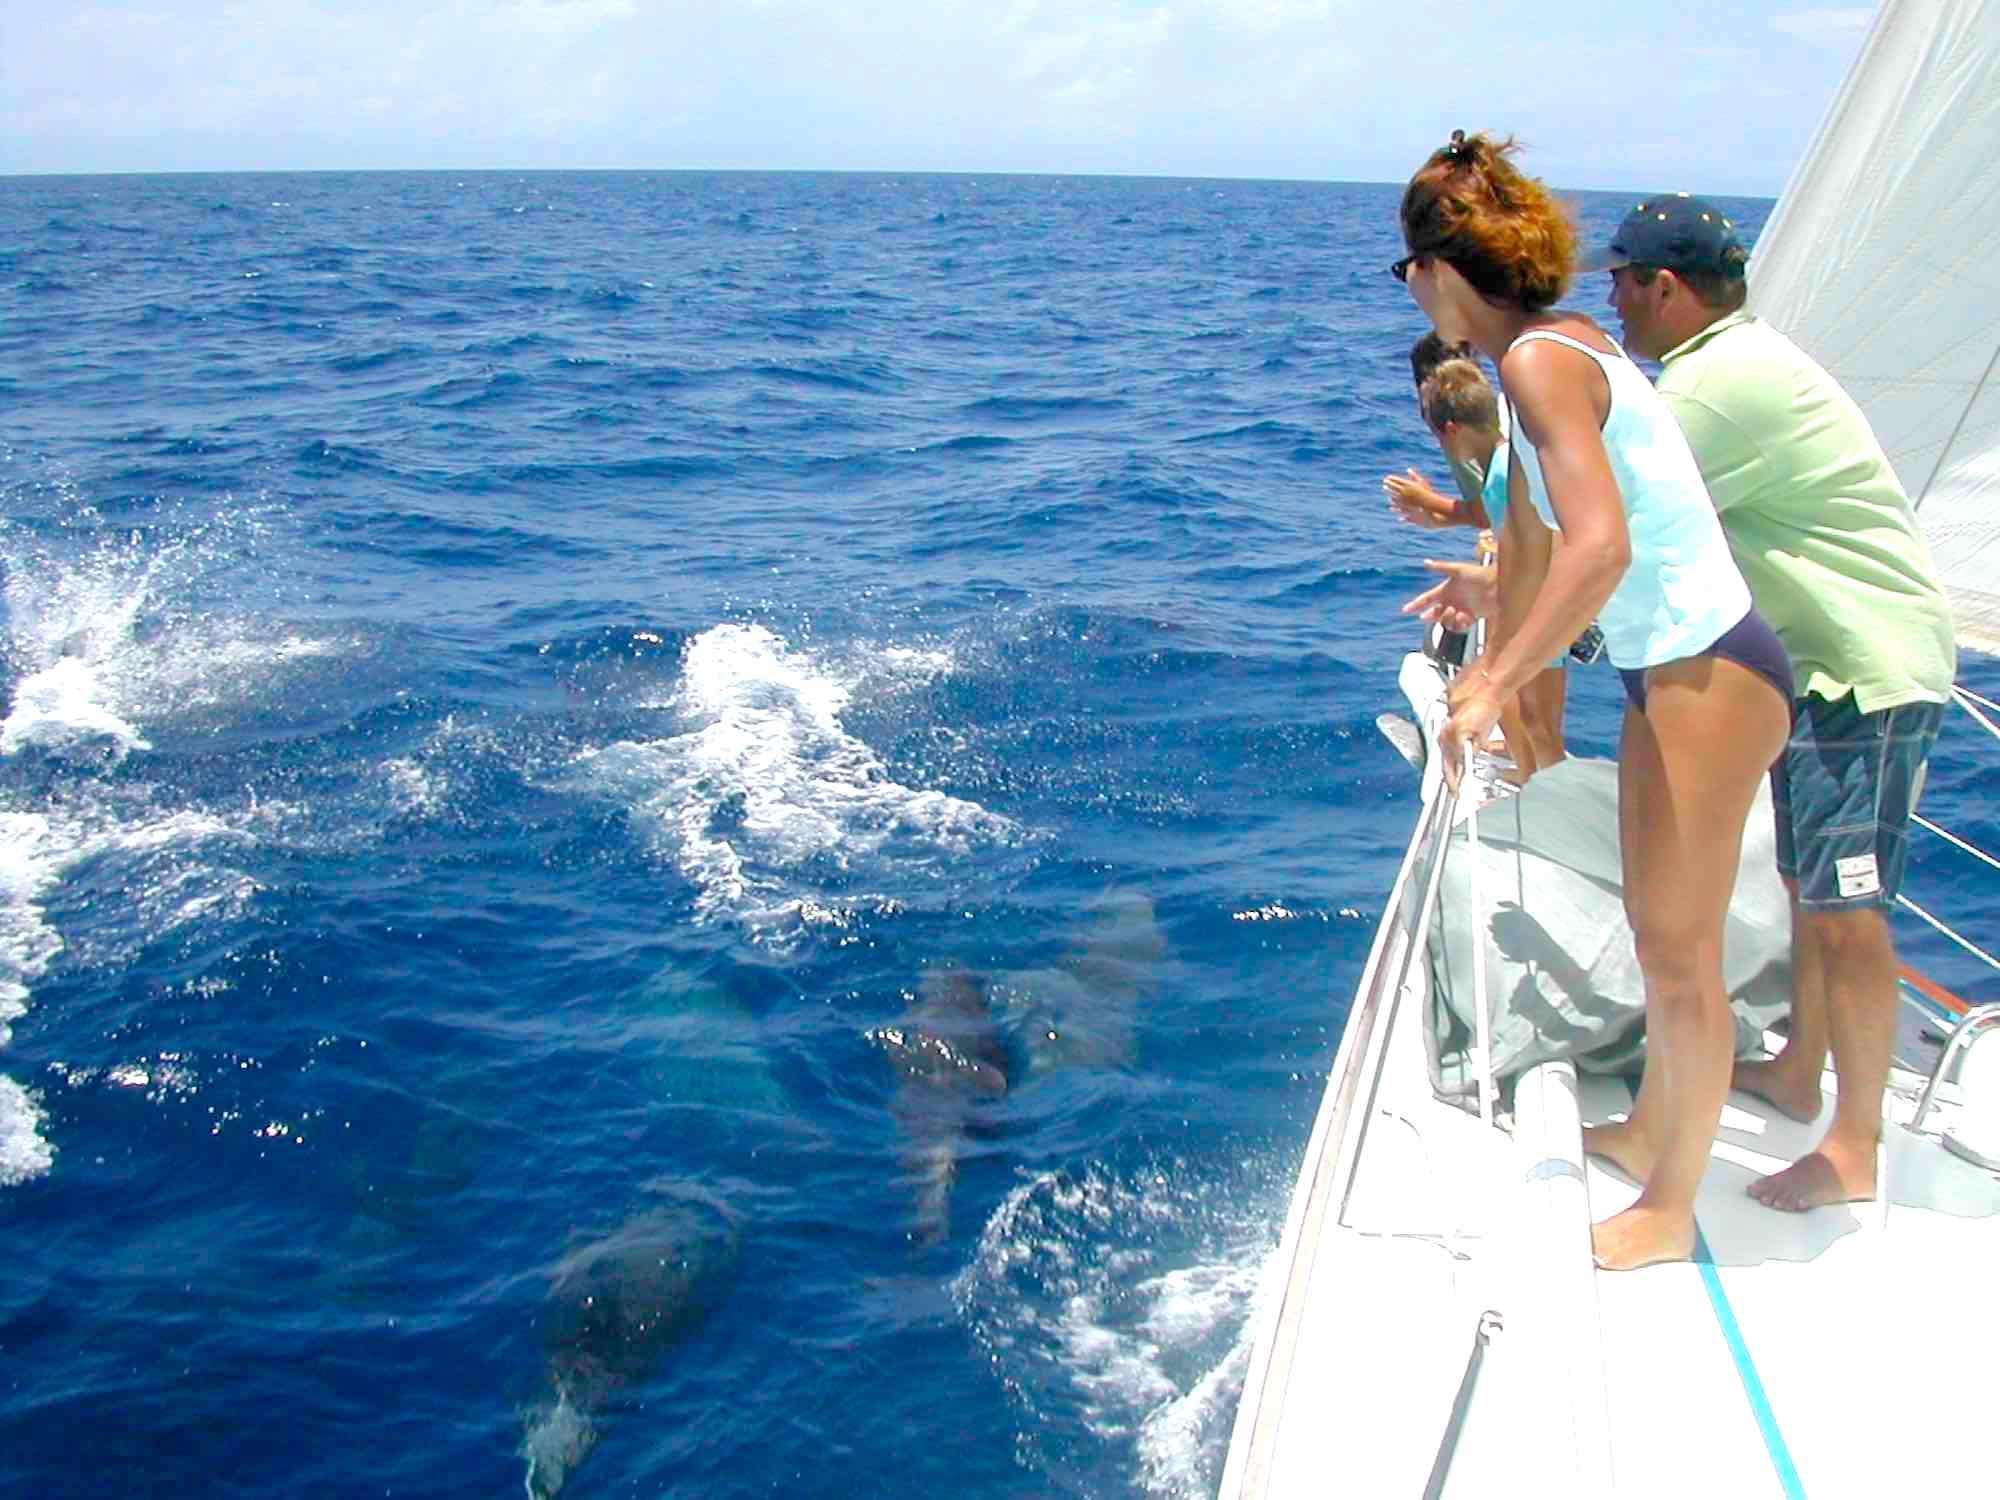 Dalai_fun dolphin watch on blue waters of Myanmar's Mergui_XS.jpeg